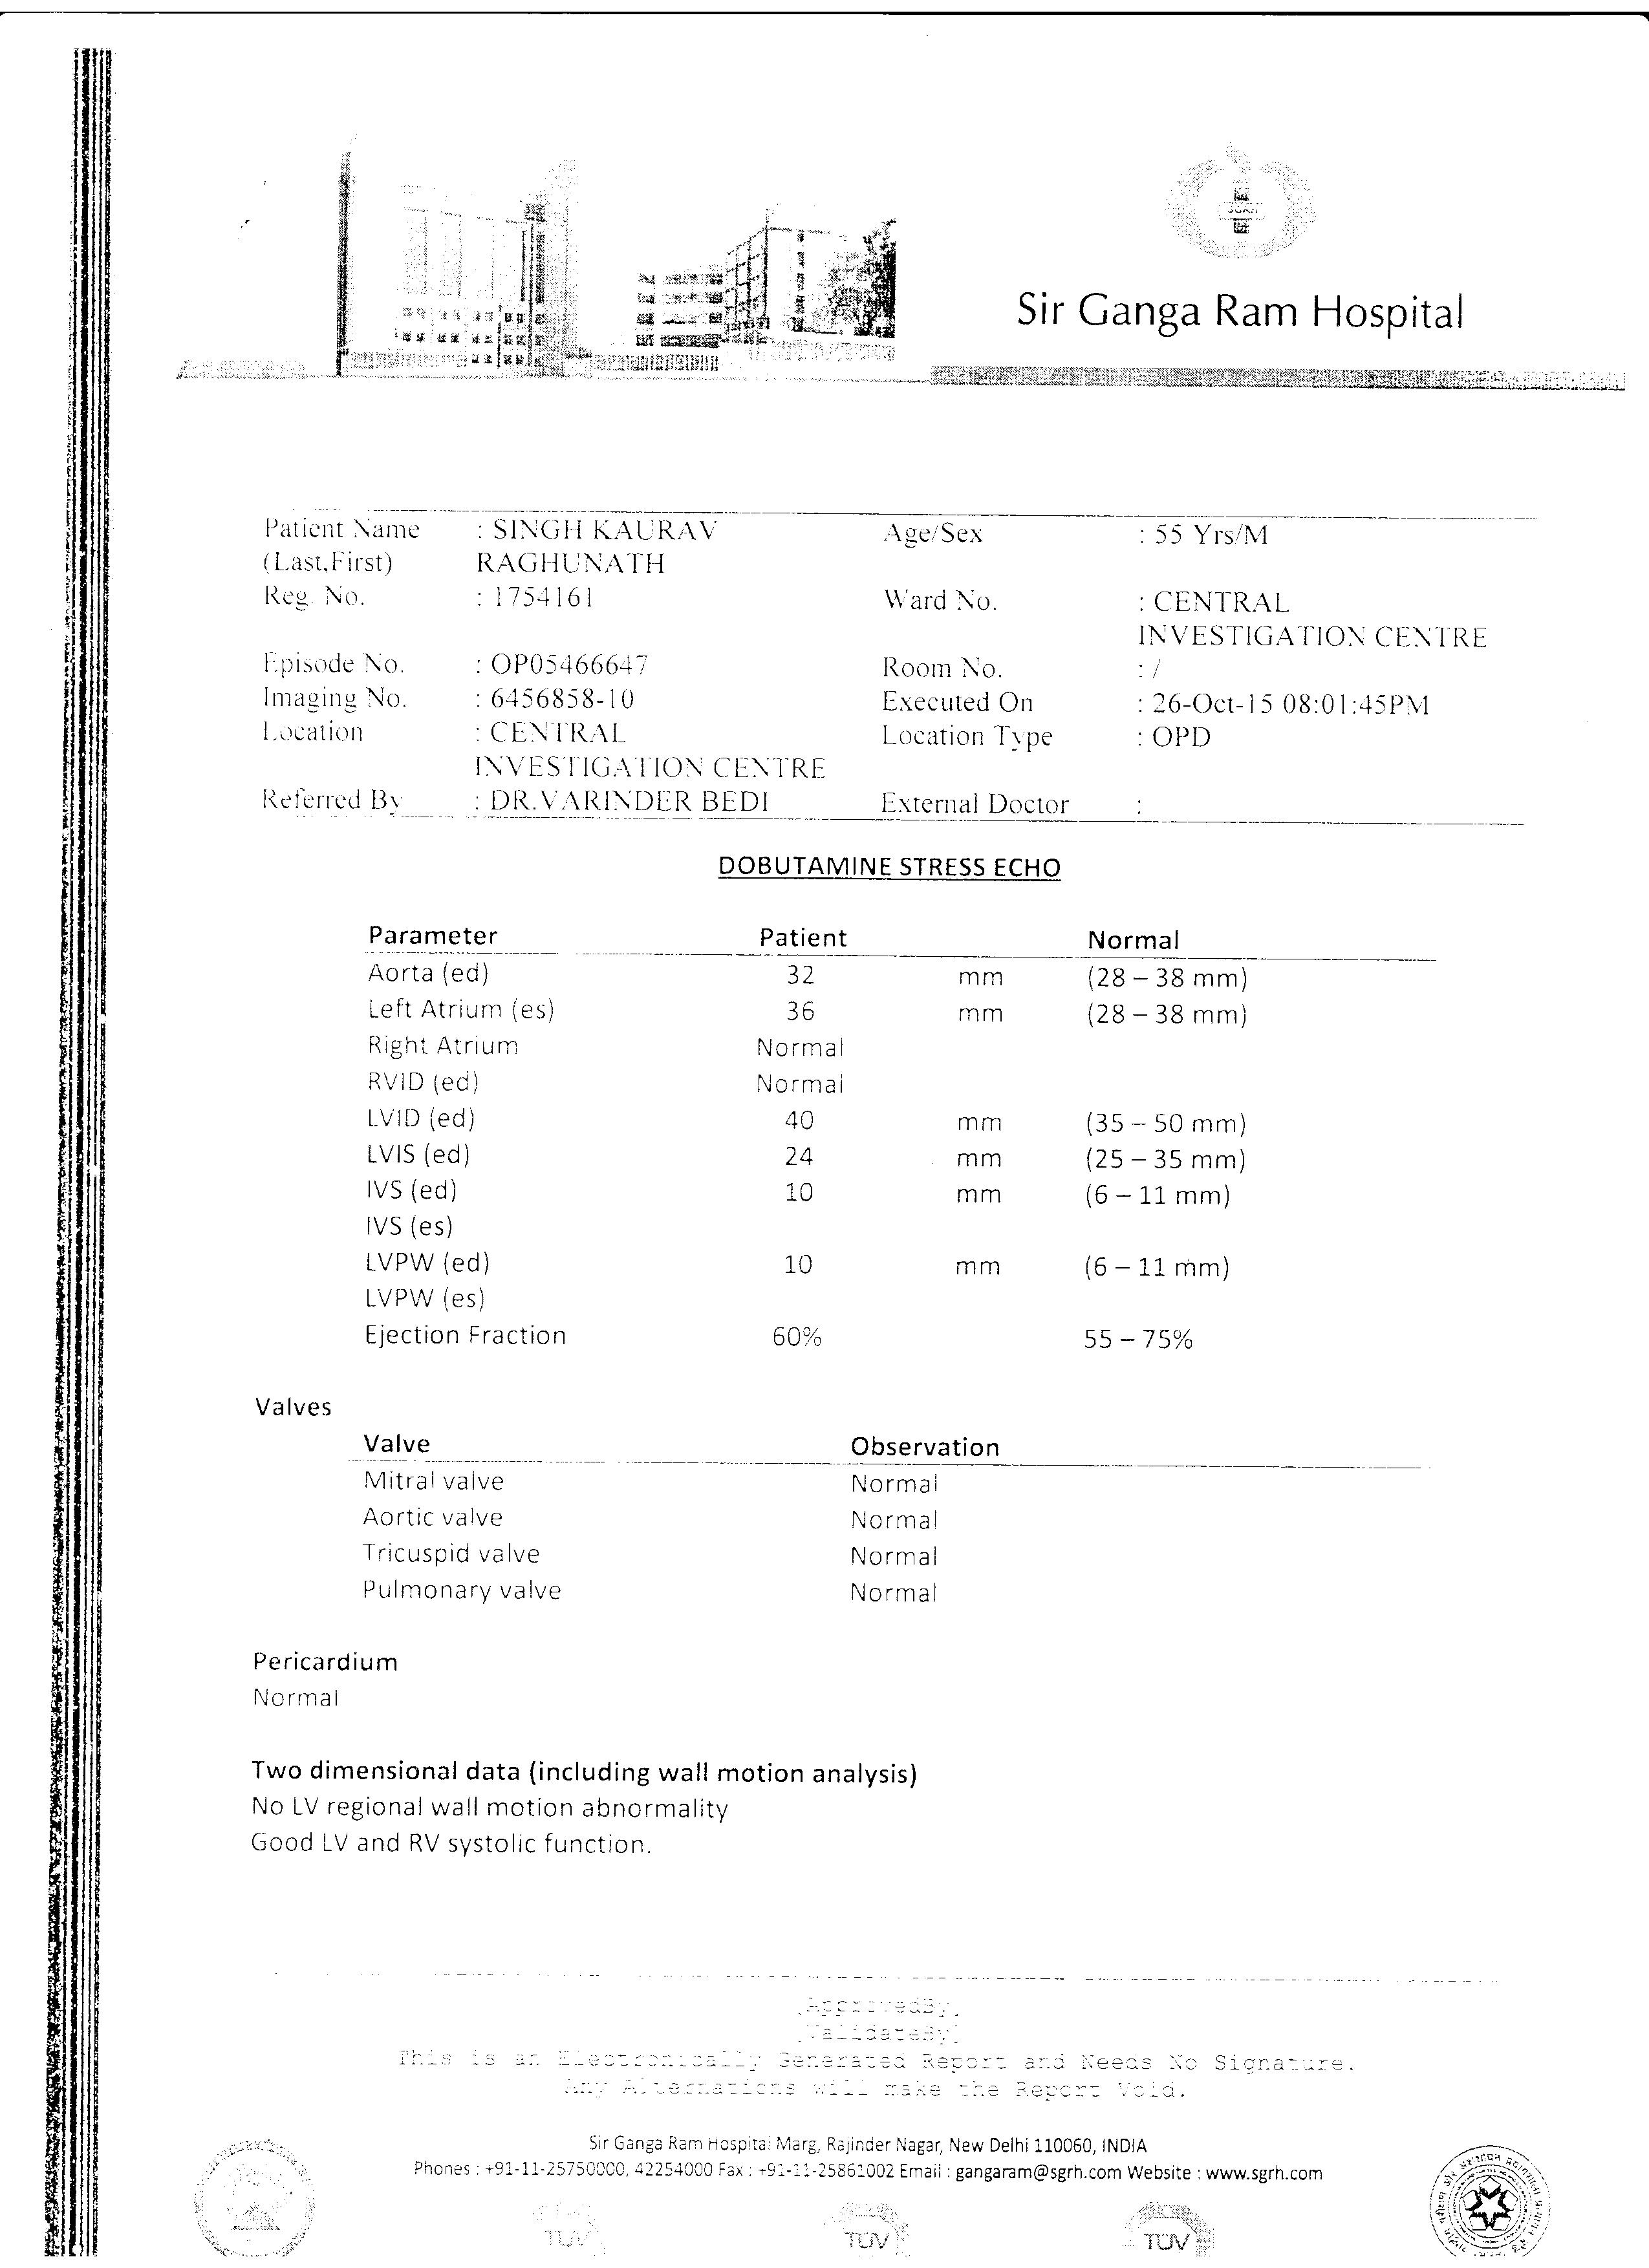 RAGHUNATH-SINGH-KAURAV-57-Yrs-DVT-treatment-6